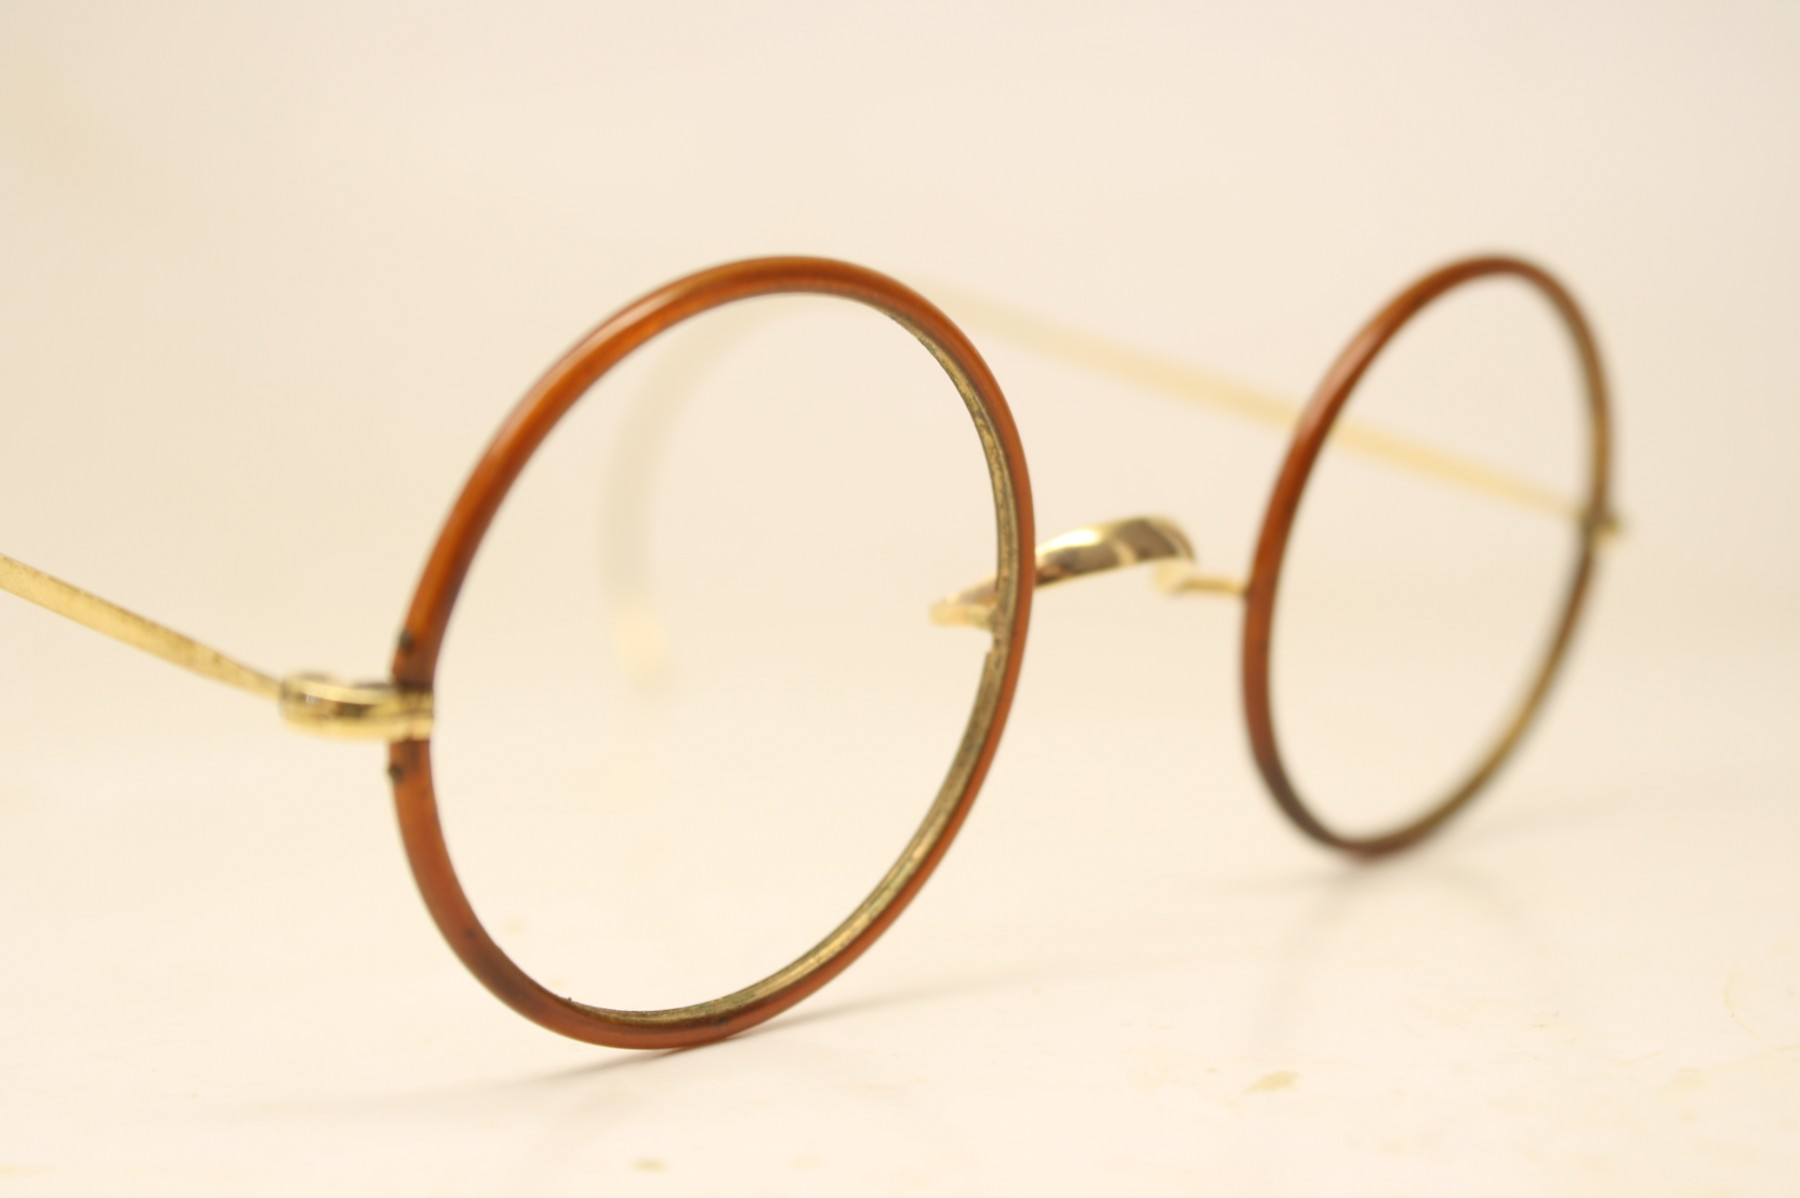 086805246e5c 1900's eyeglasses American antique ...